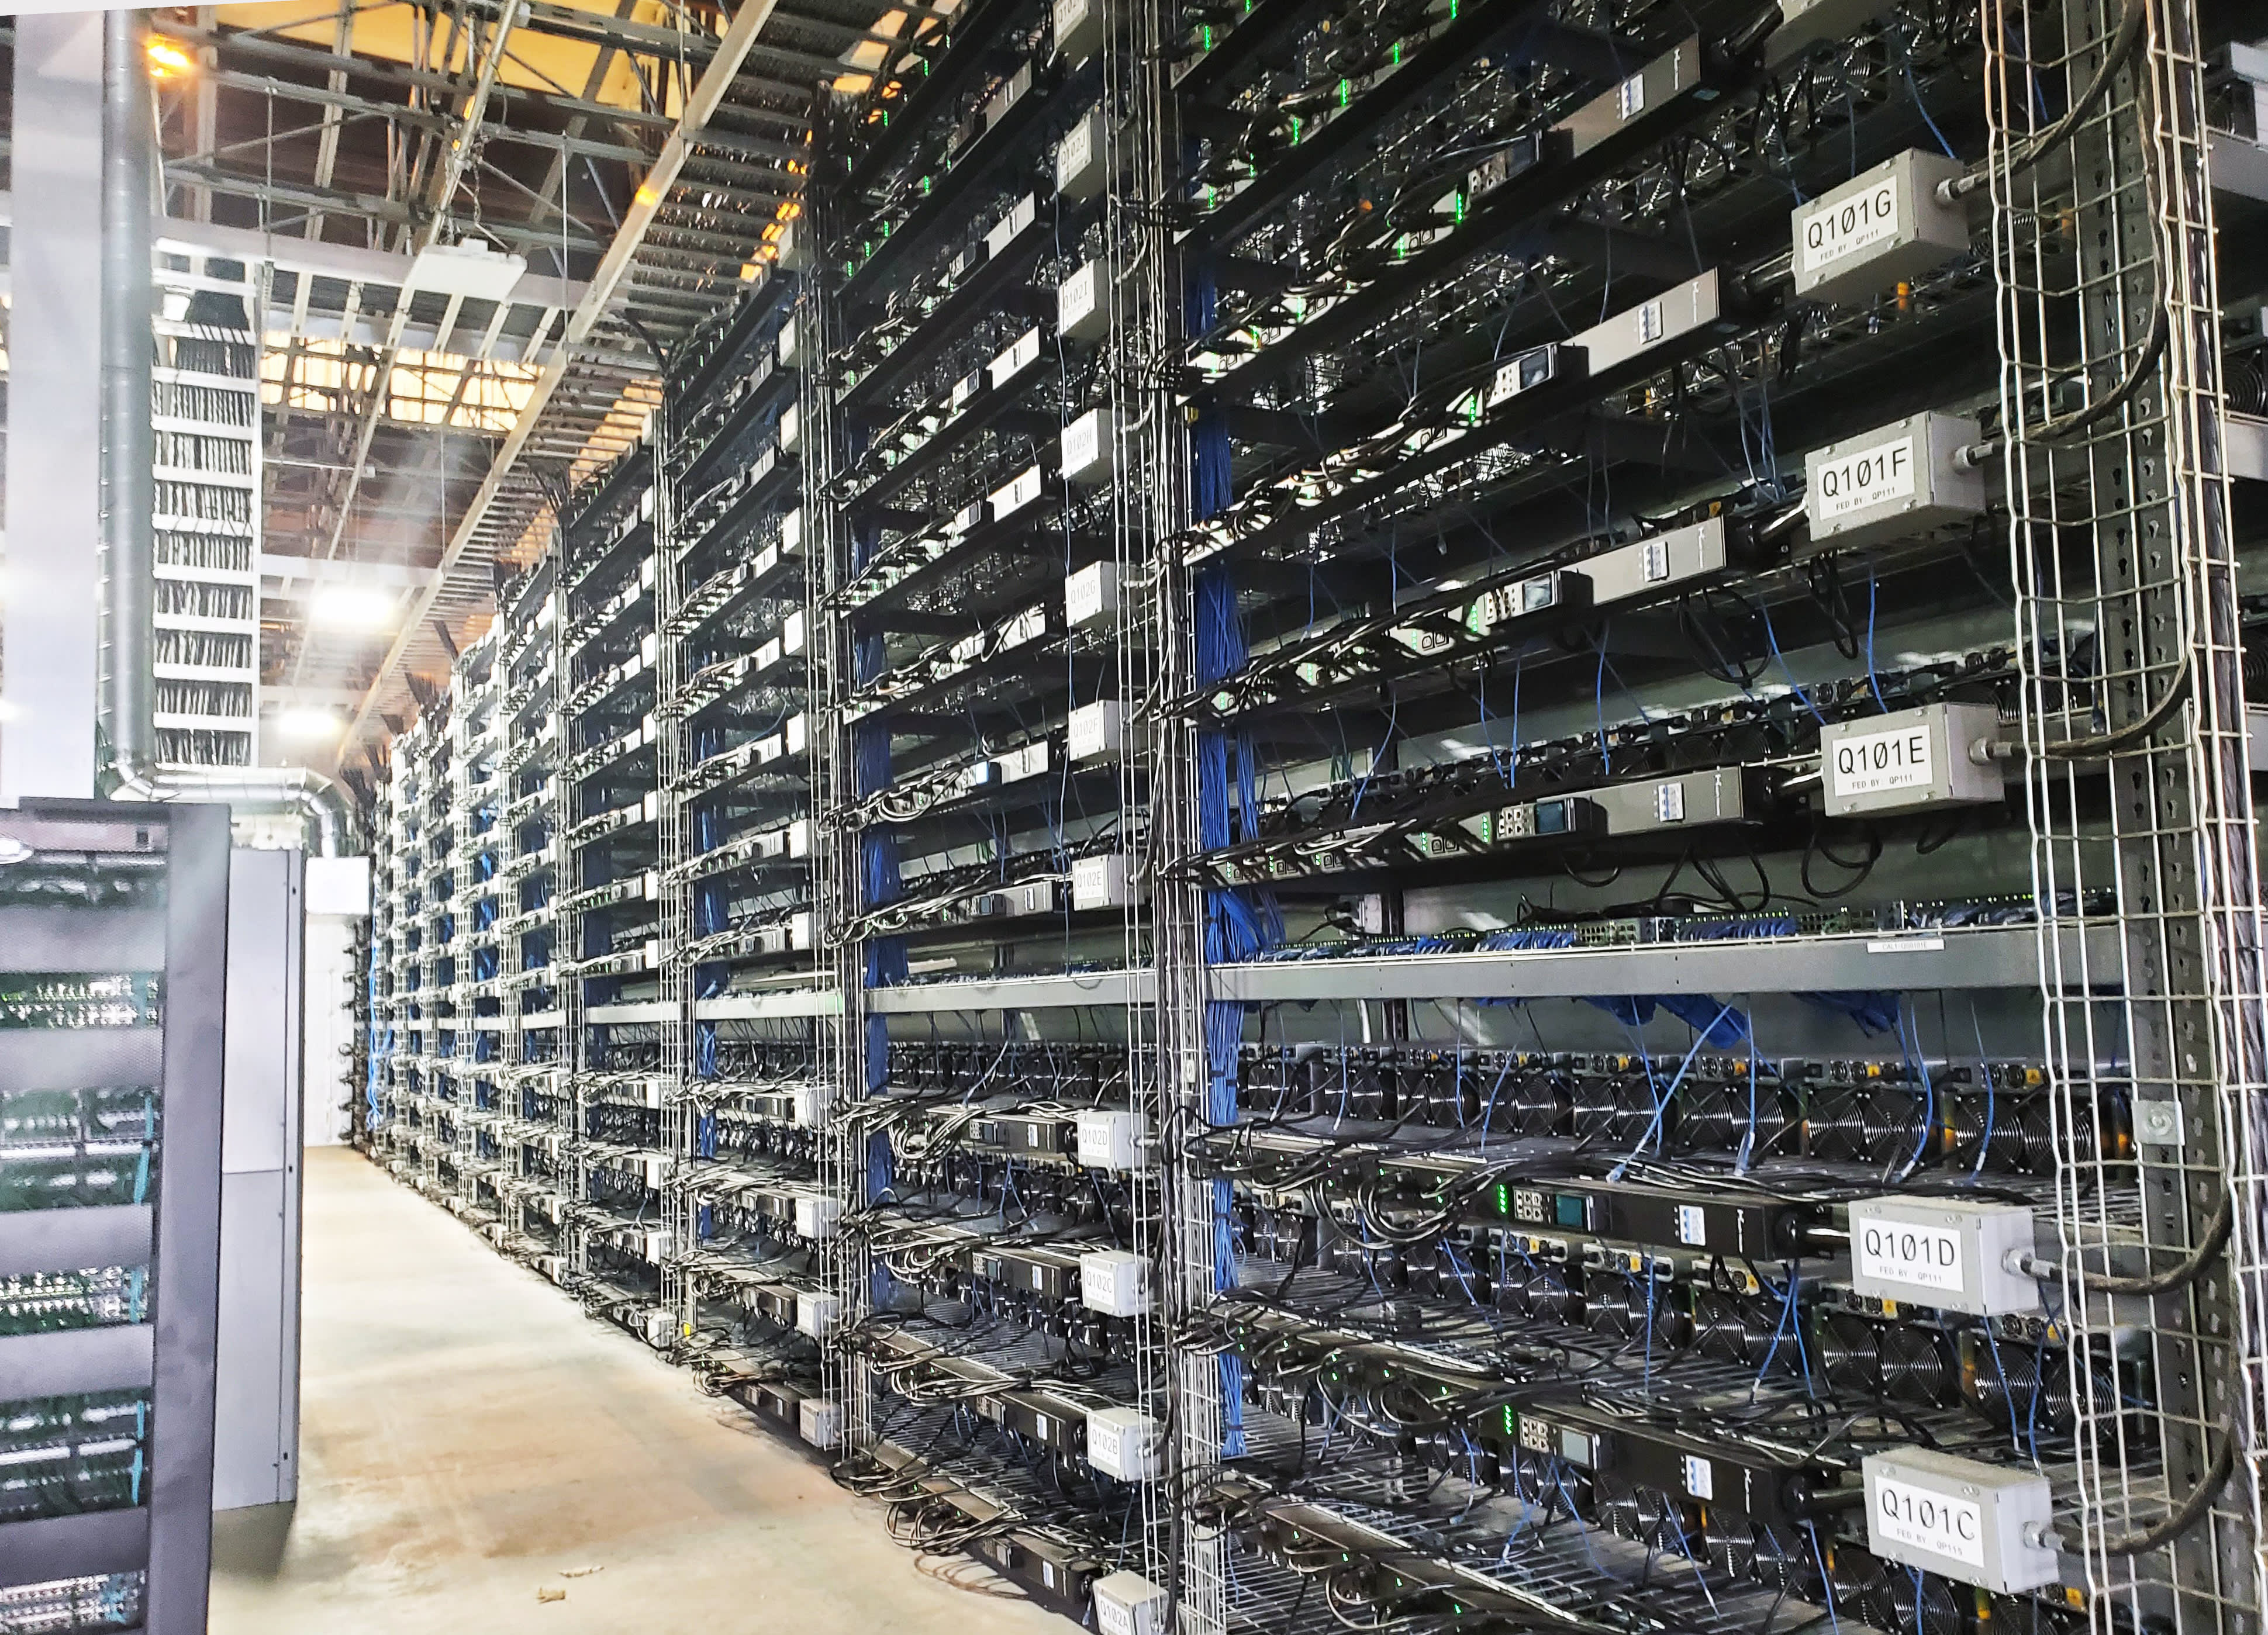 Core Scientific, a major U.S. bitcoin mining company, is going public via SPAC thumbnail